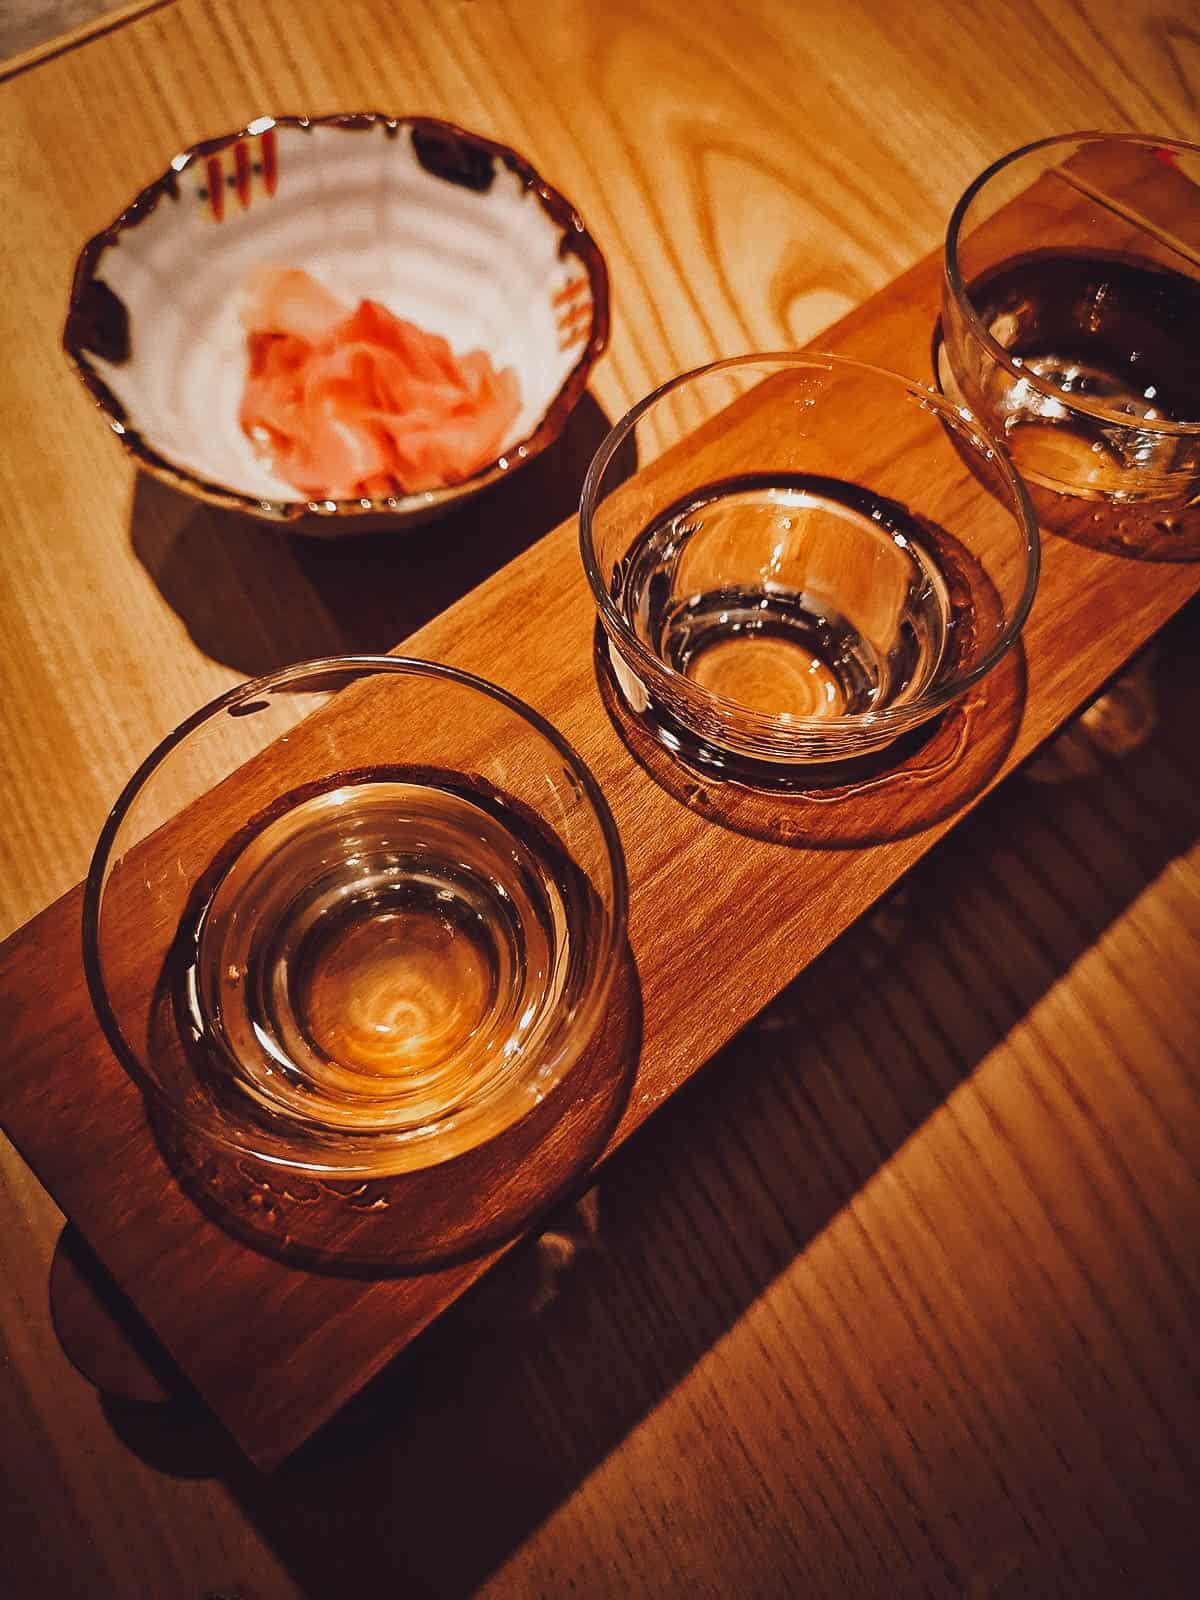 Flight of sake with gari or pickled ginger